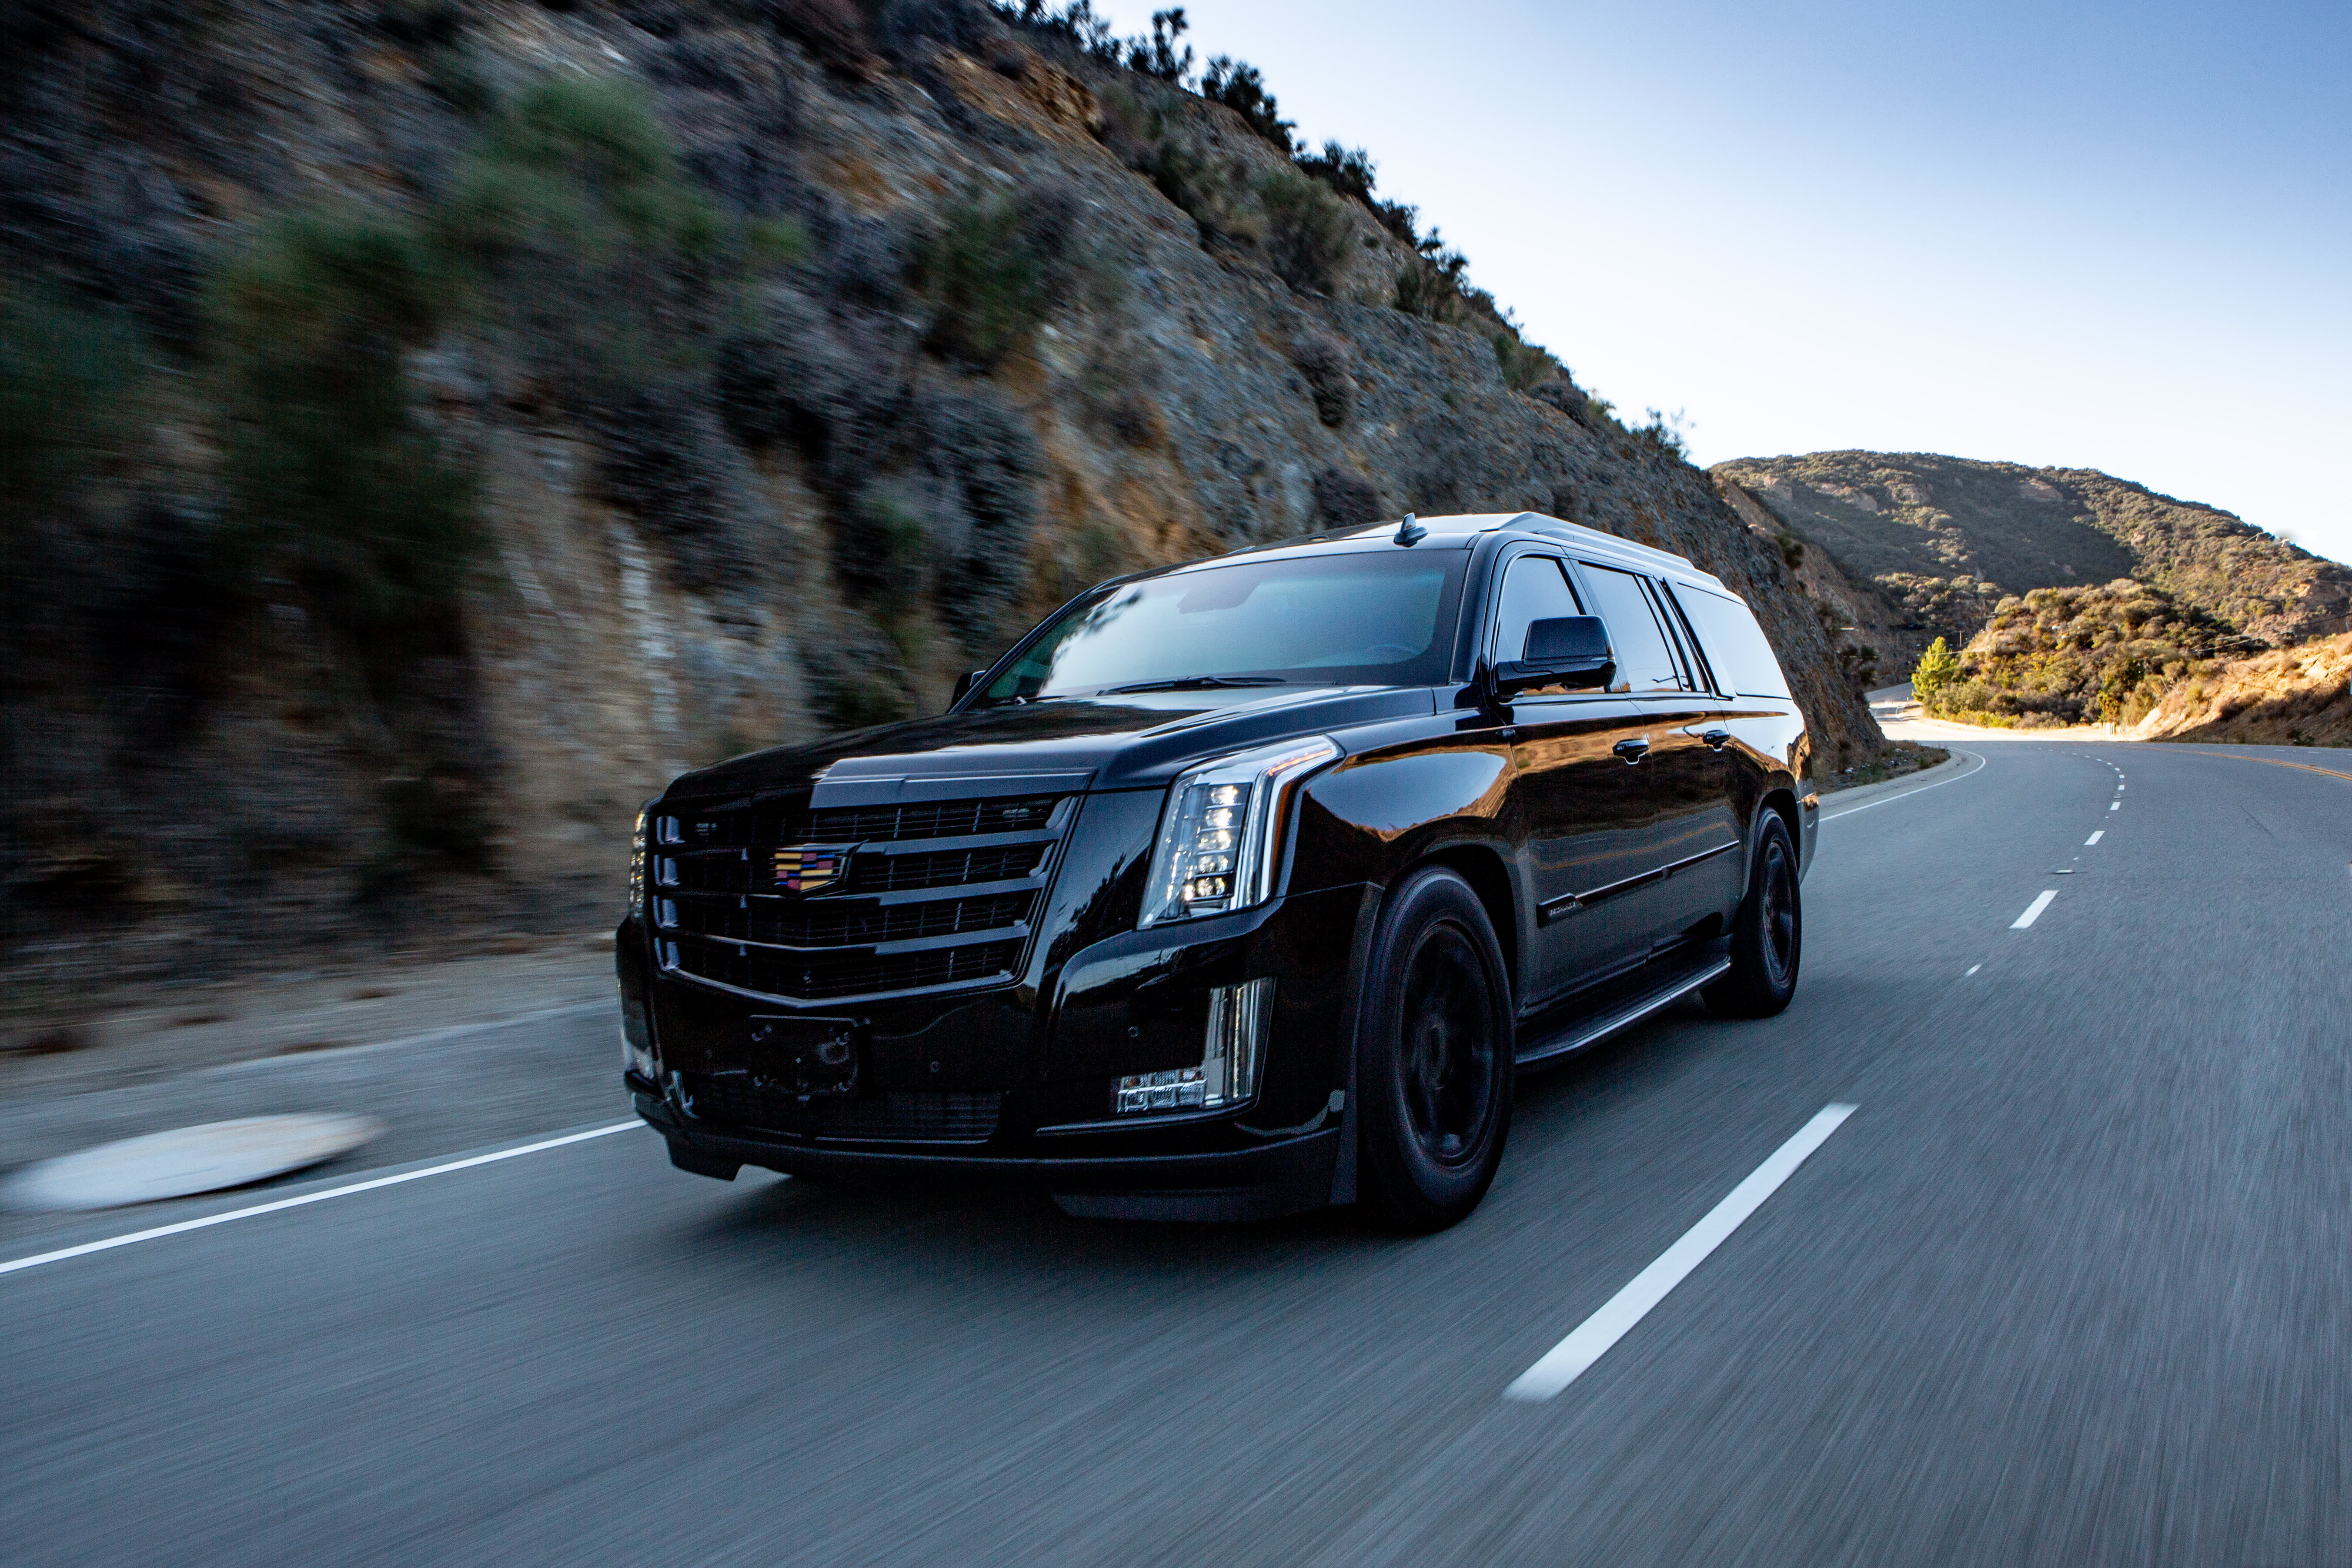 Photos 350 000 Bulletproof Cadillac Escalade